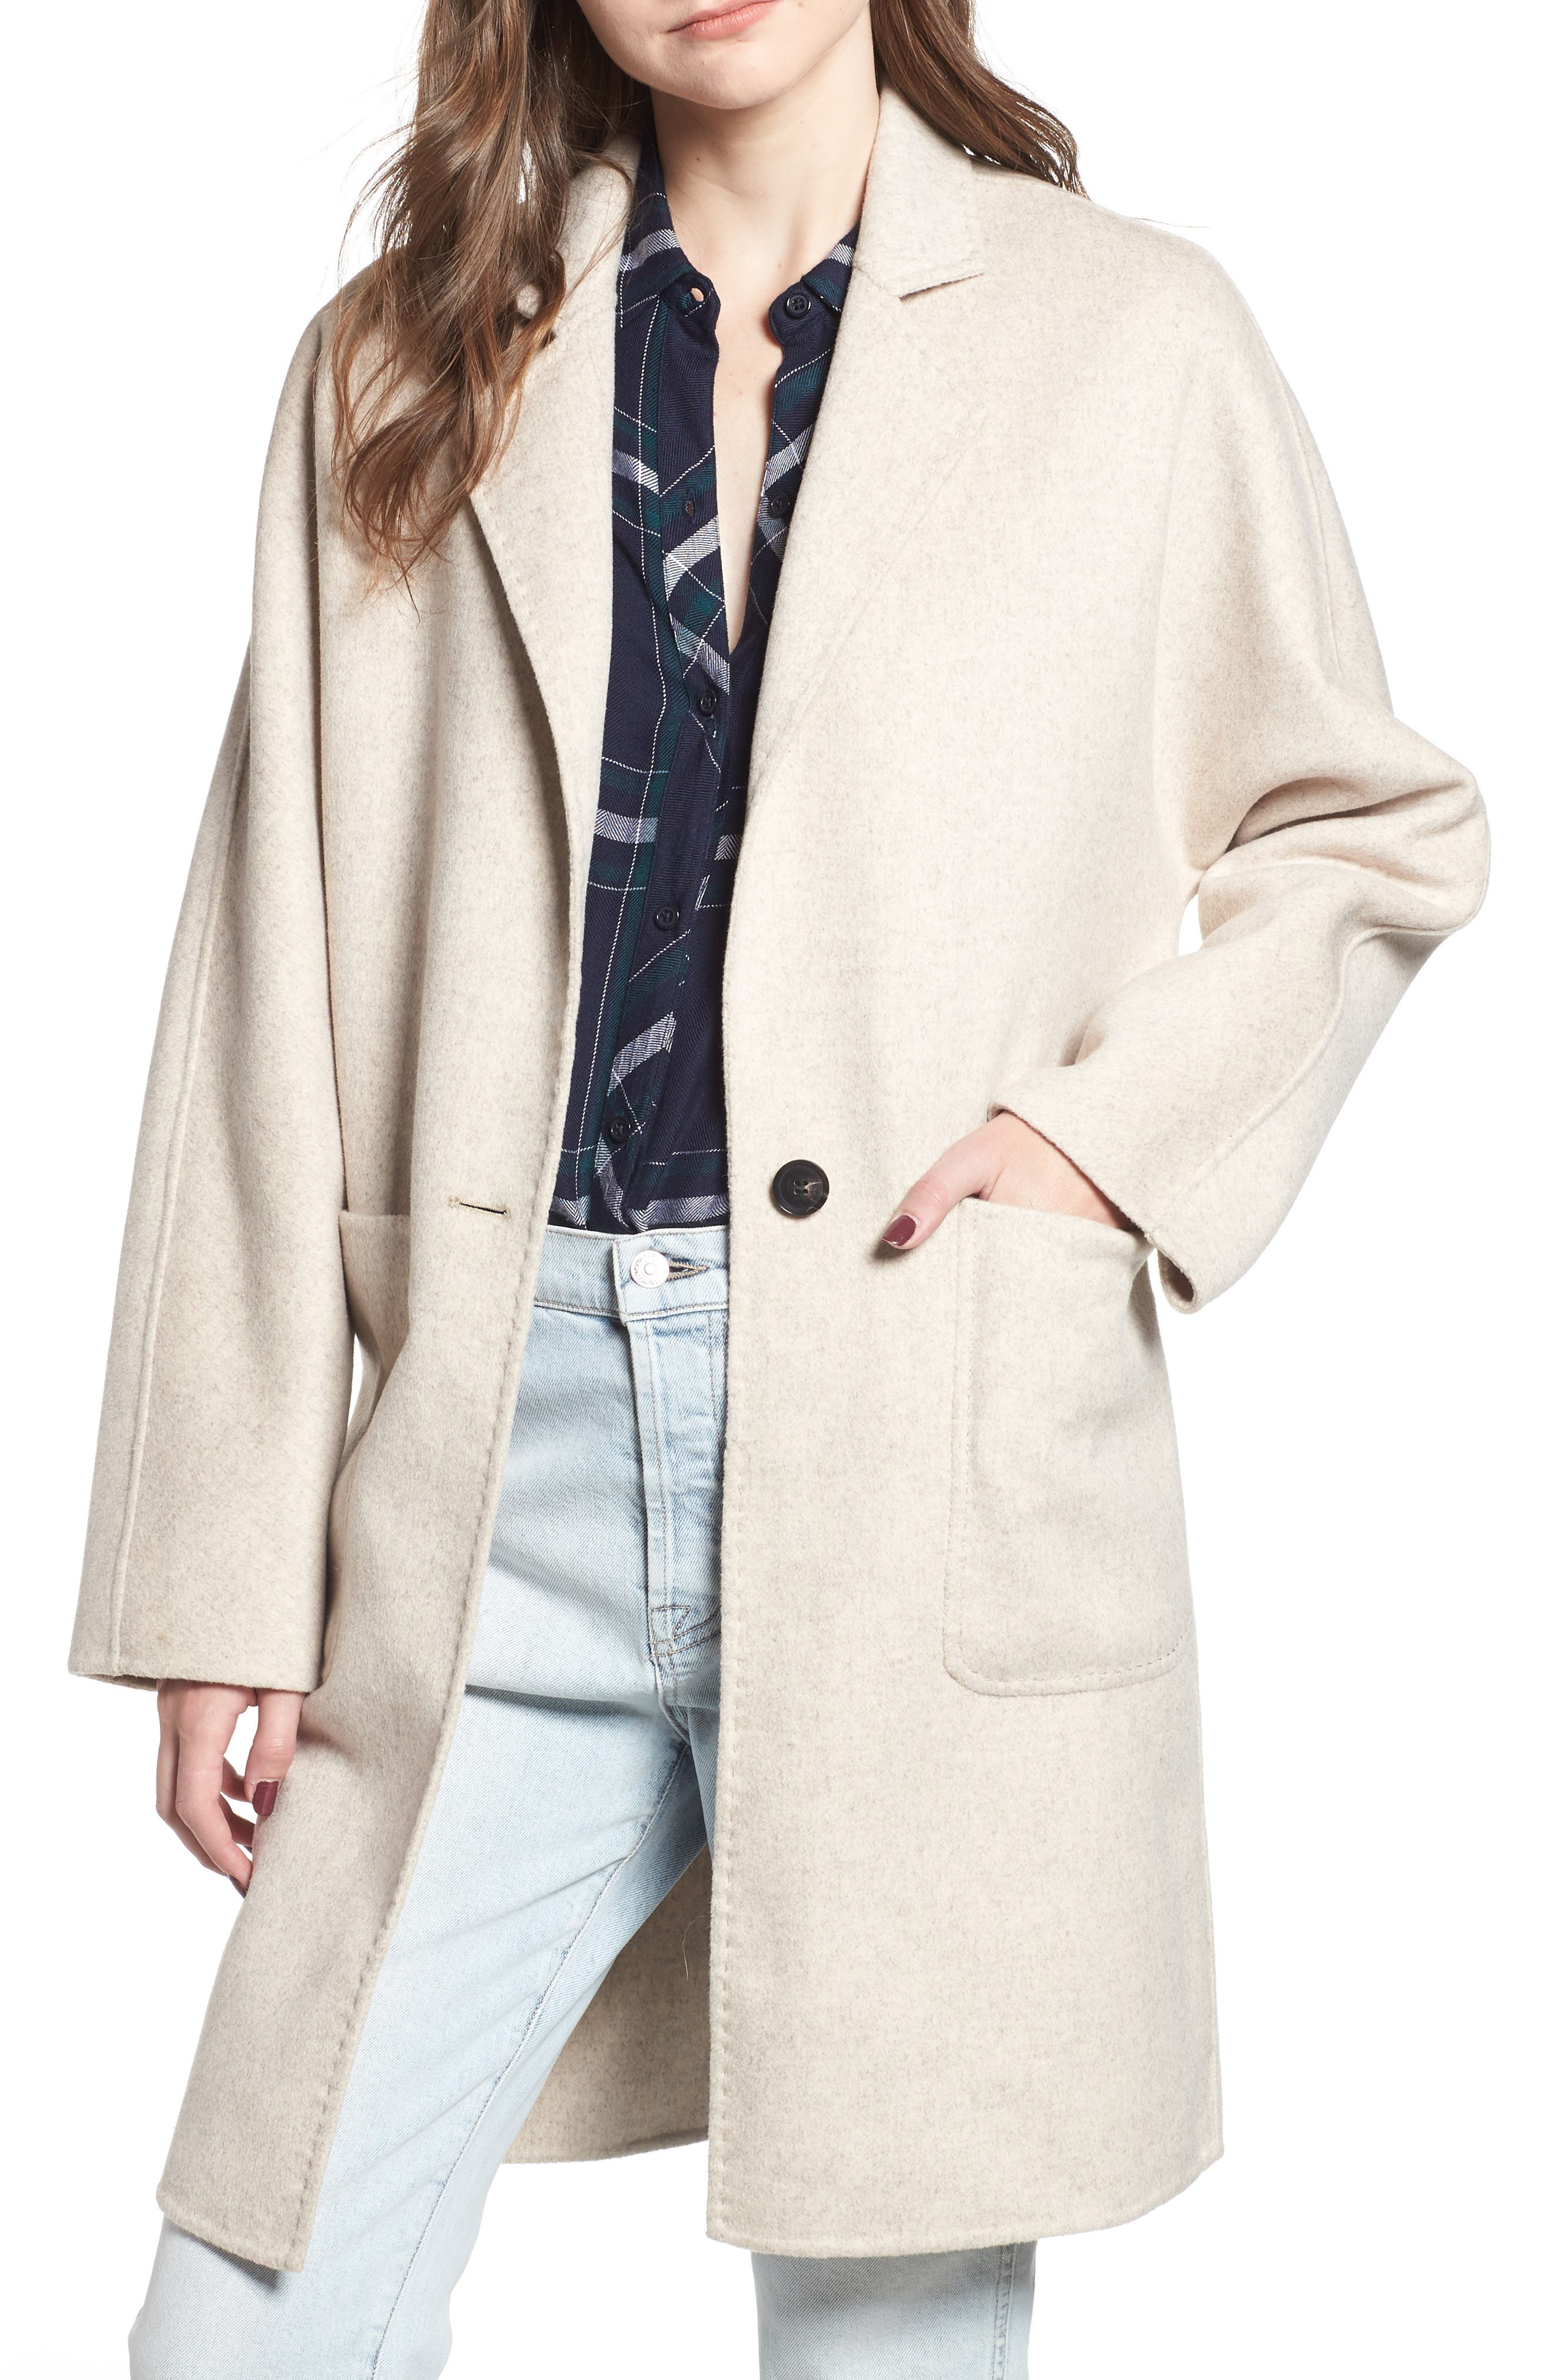 Everest Wool Blend Coat,                         Main,                         color, OATMEAL